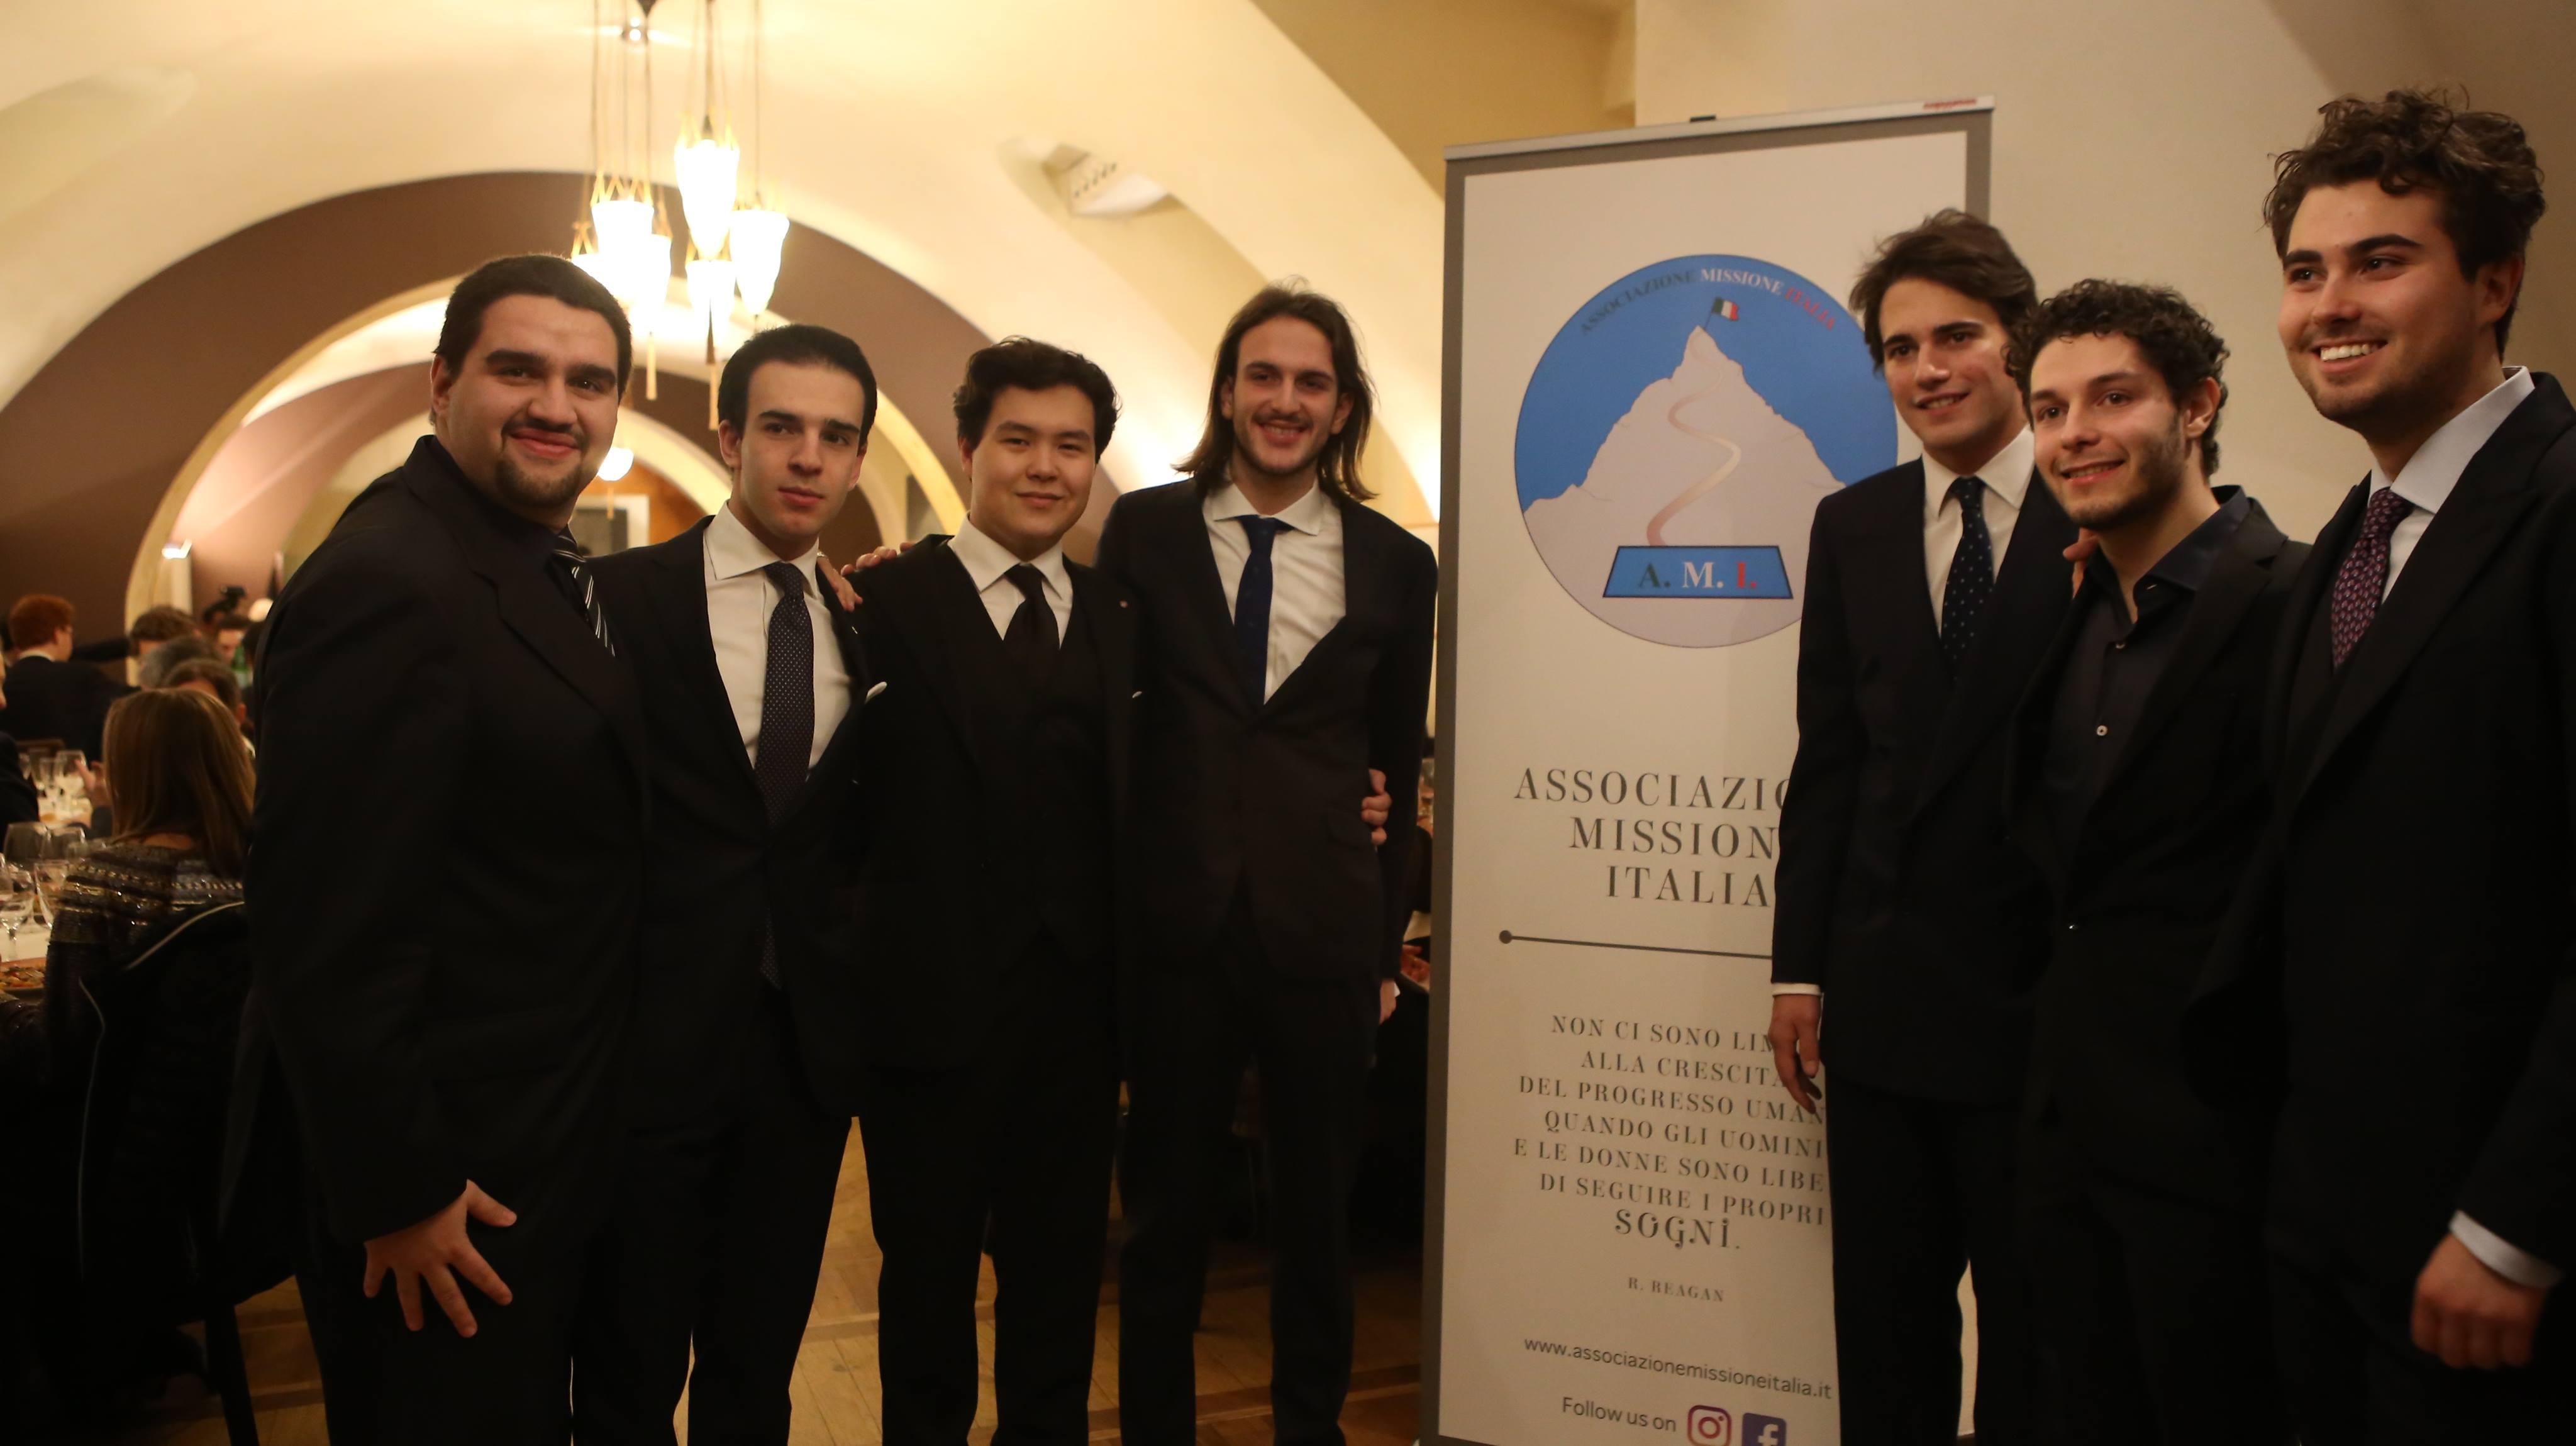 missione italia